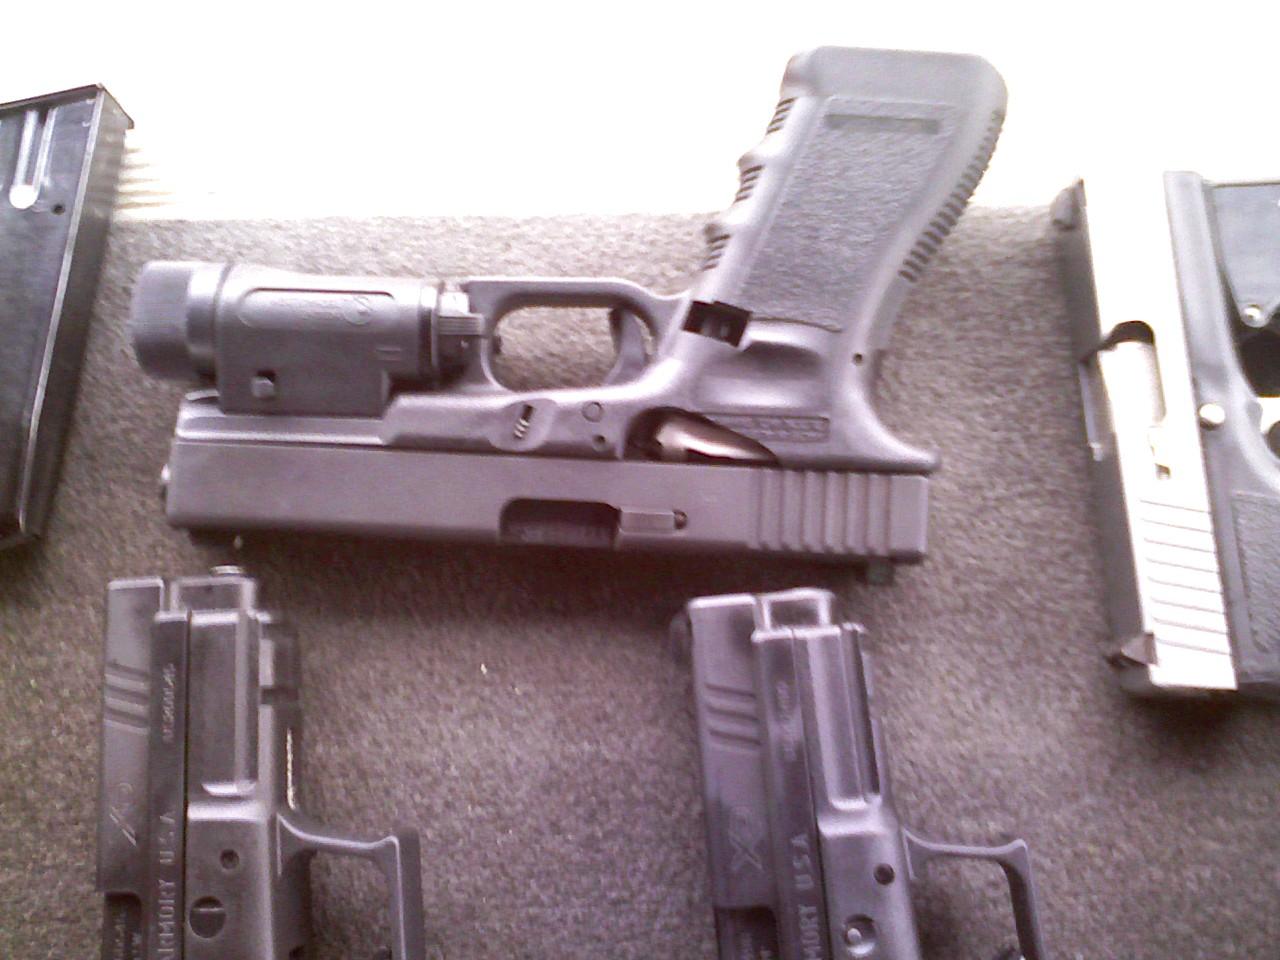 Glock 22 Kb at the range today-pic-0019.jpg